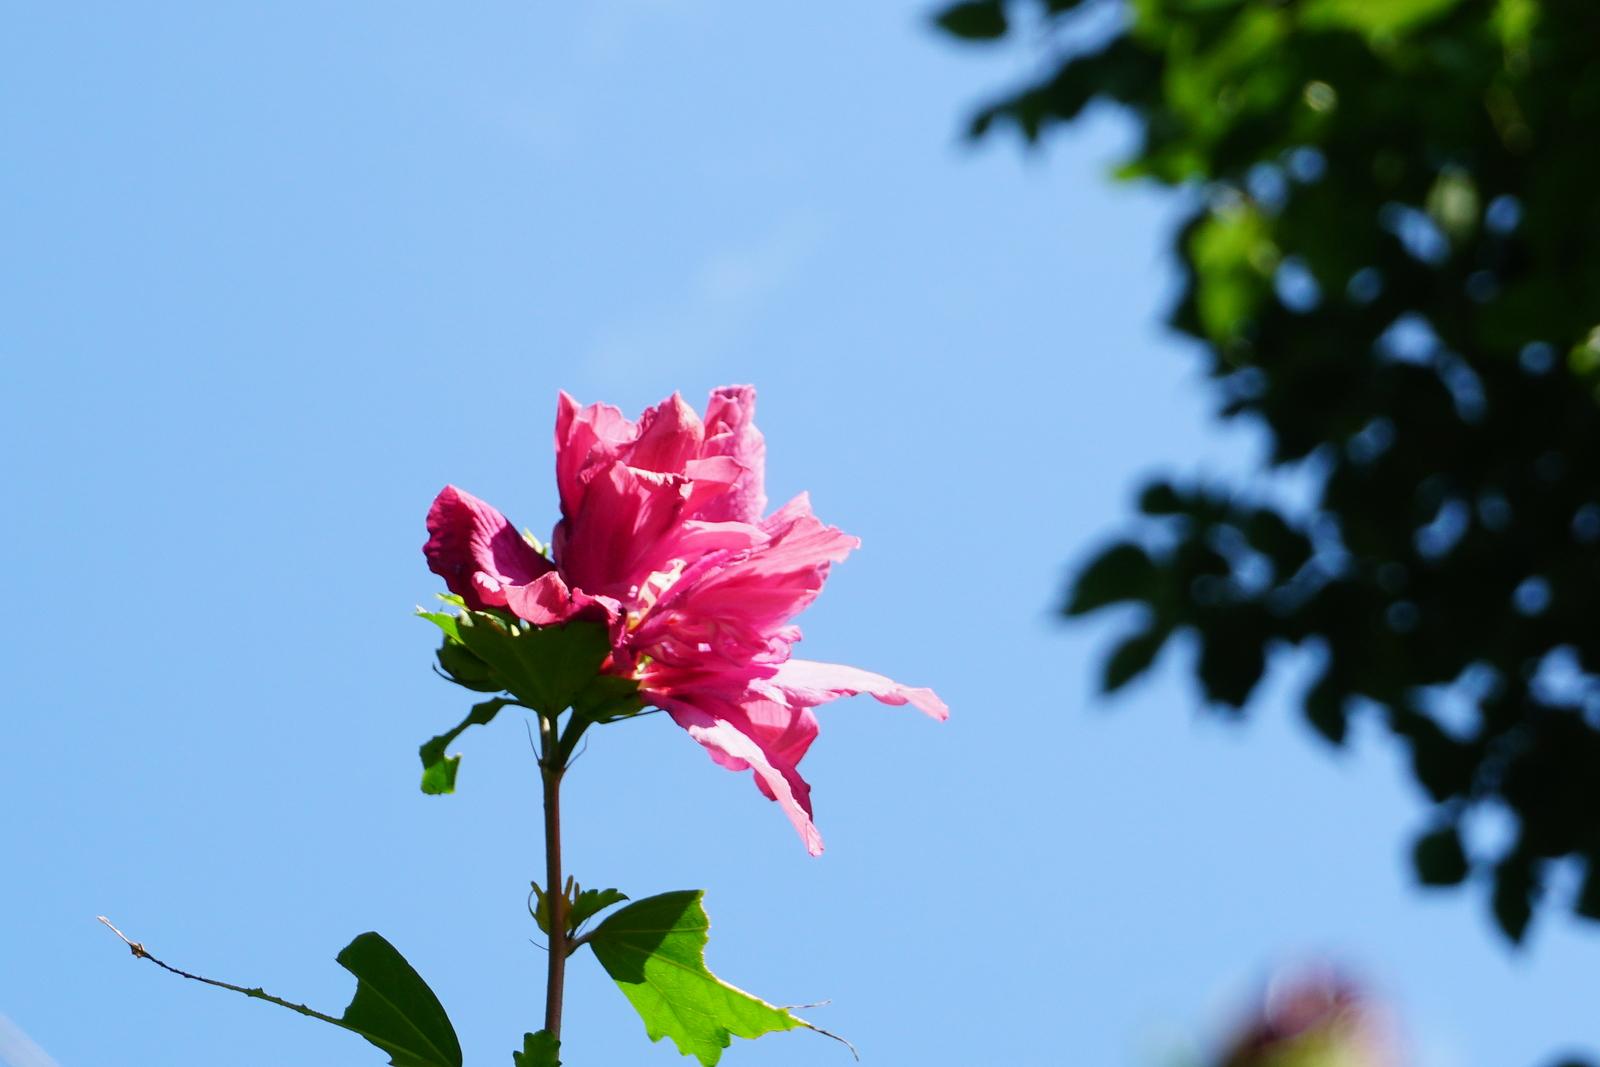 Pale rose aginst blue sky Alton August 19 2017 Anura Guruge Sony a6500